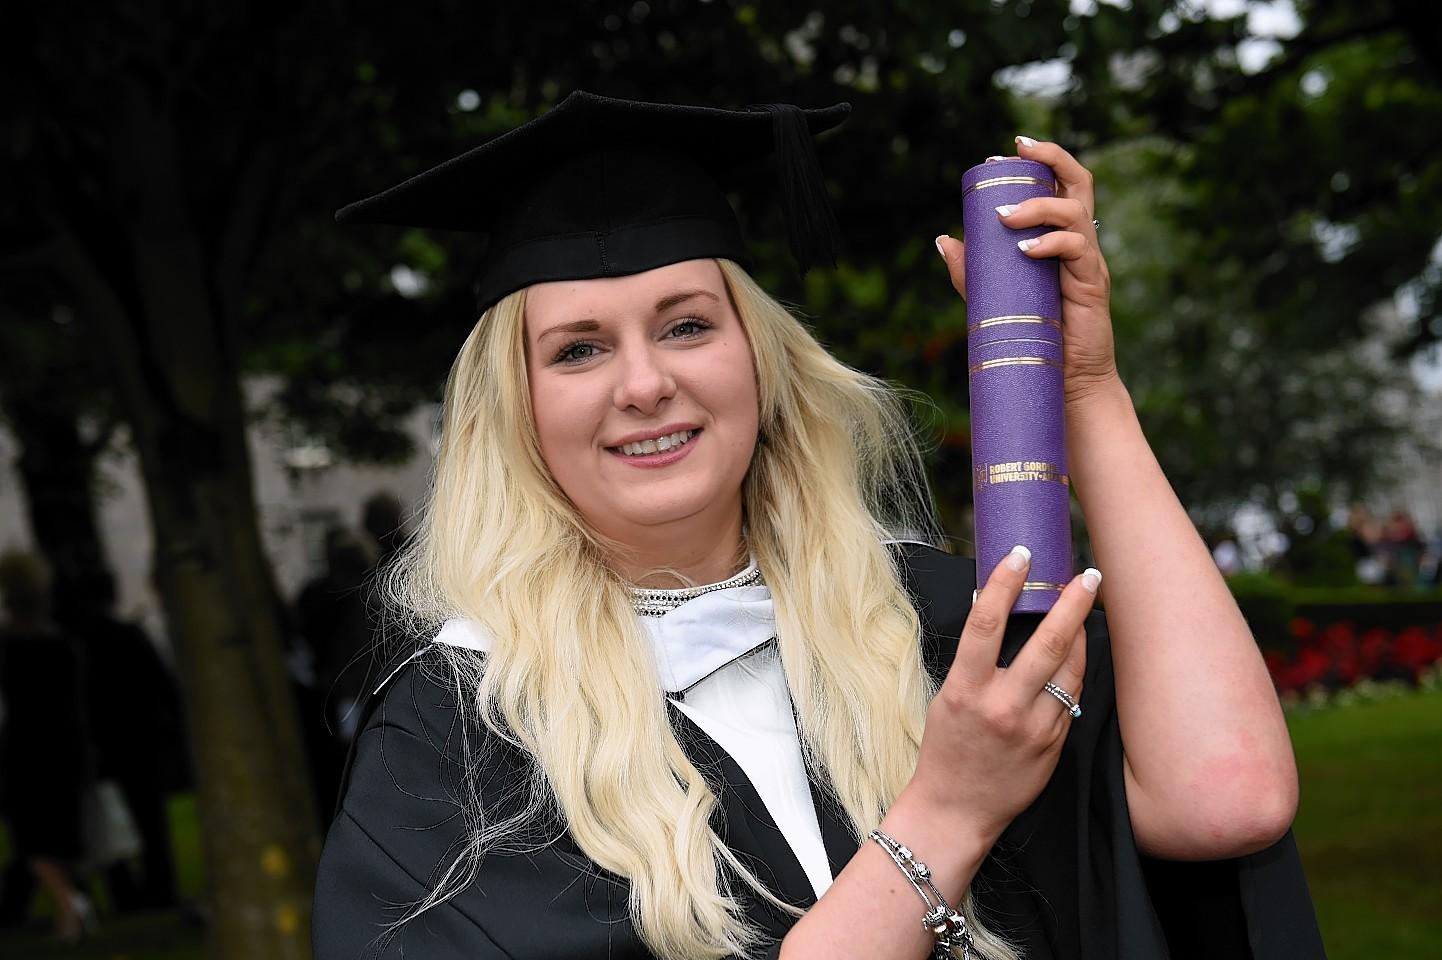 Robert Gordon University (RGU) Graduation at His Majesty's Theatre in Aberdeen - Sarah McNeil